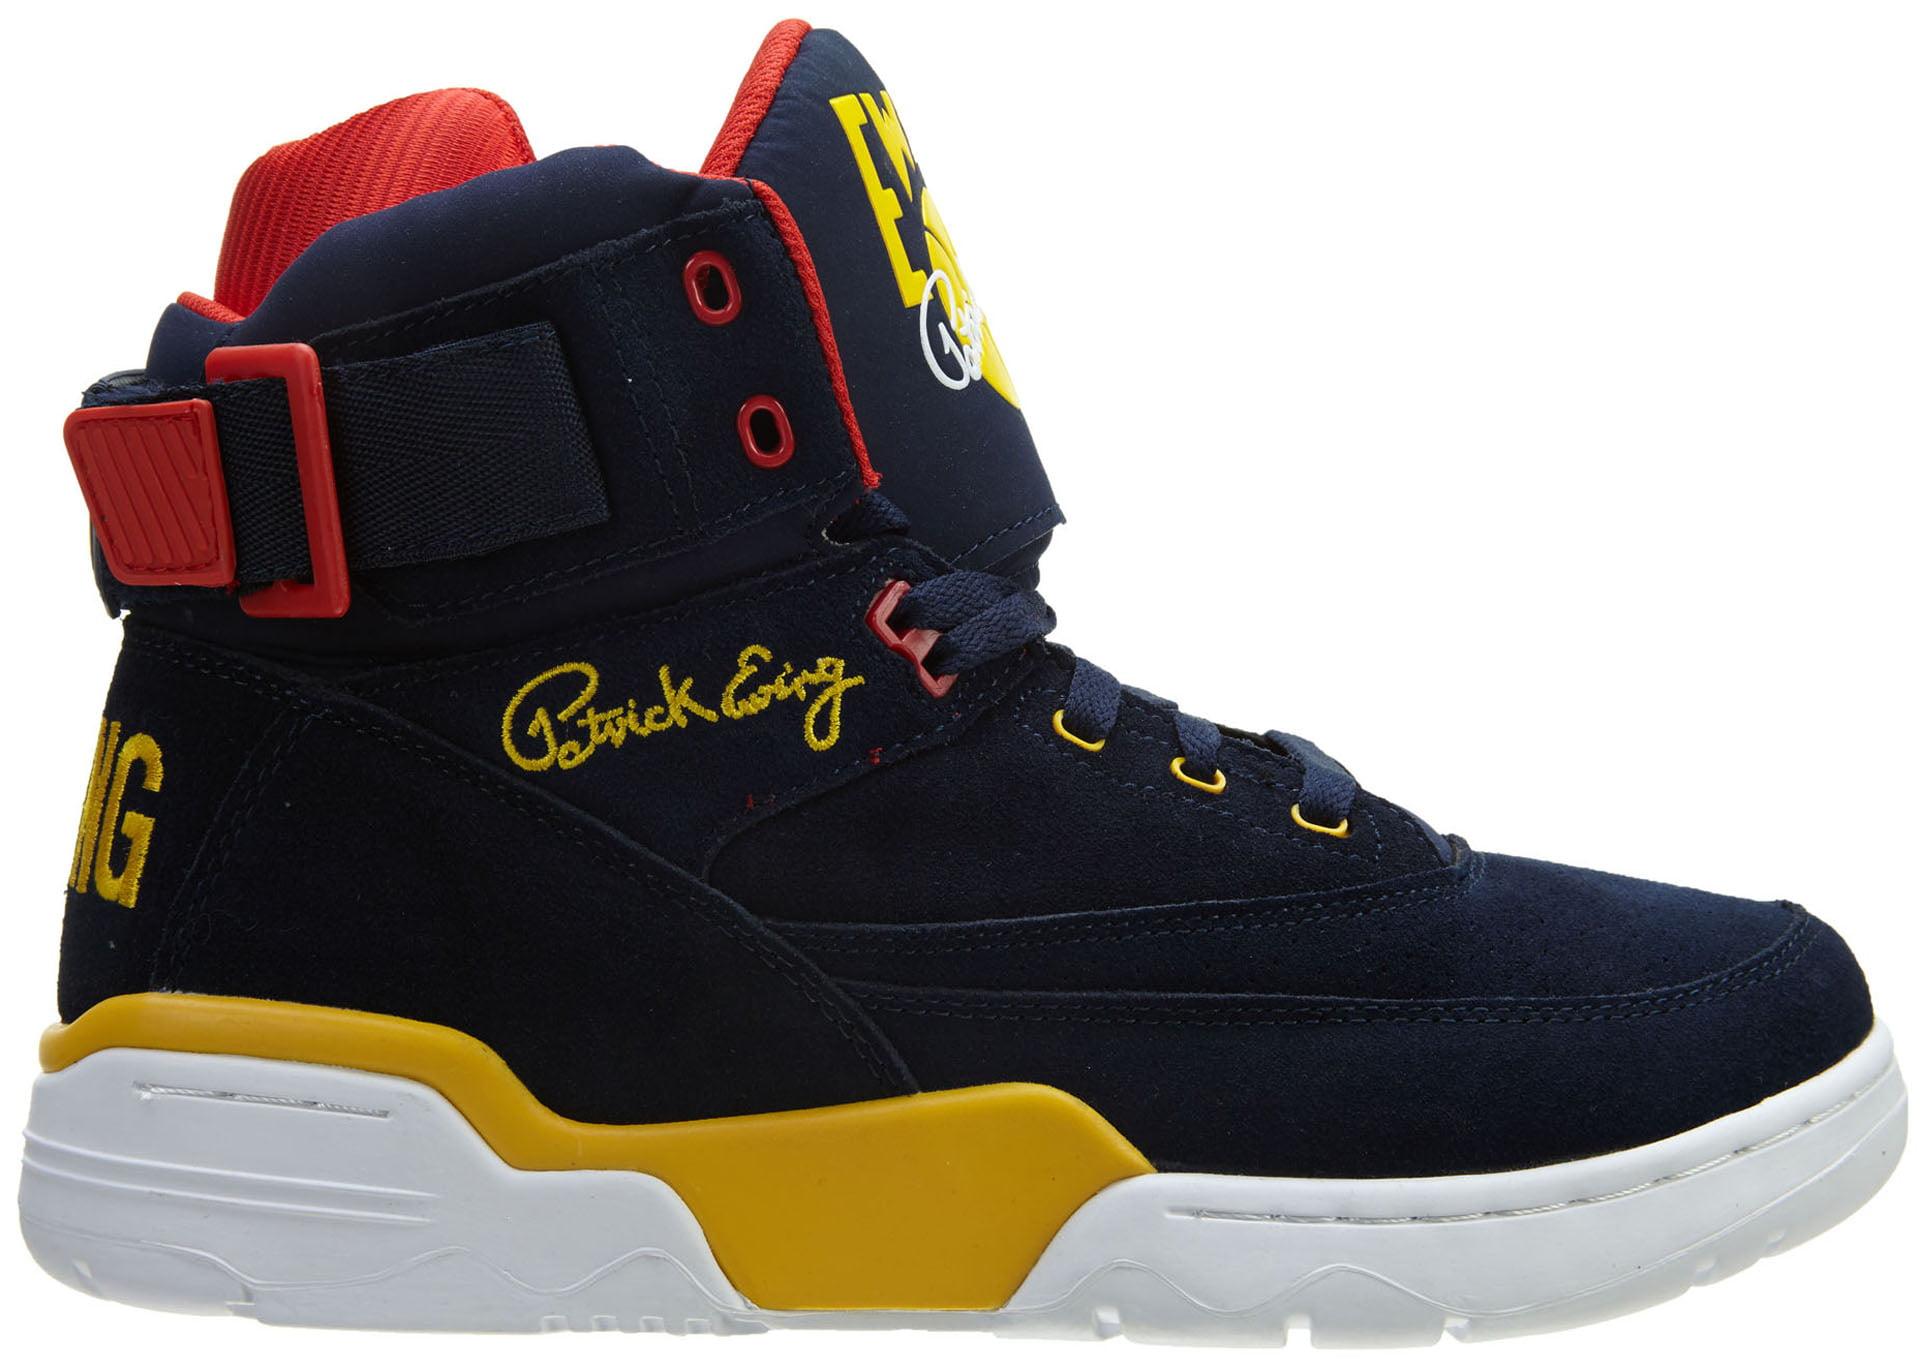 Ewing Navy/Yellow/Red Athletics Ewing 33 Hi Navy/Yellow/Red Ewing Men's Basketball Shoes 1EW90128-433 28341b